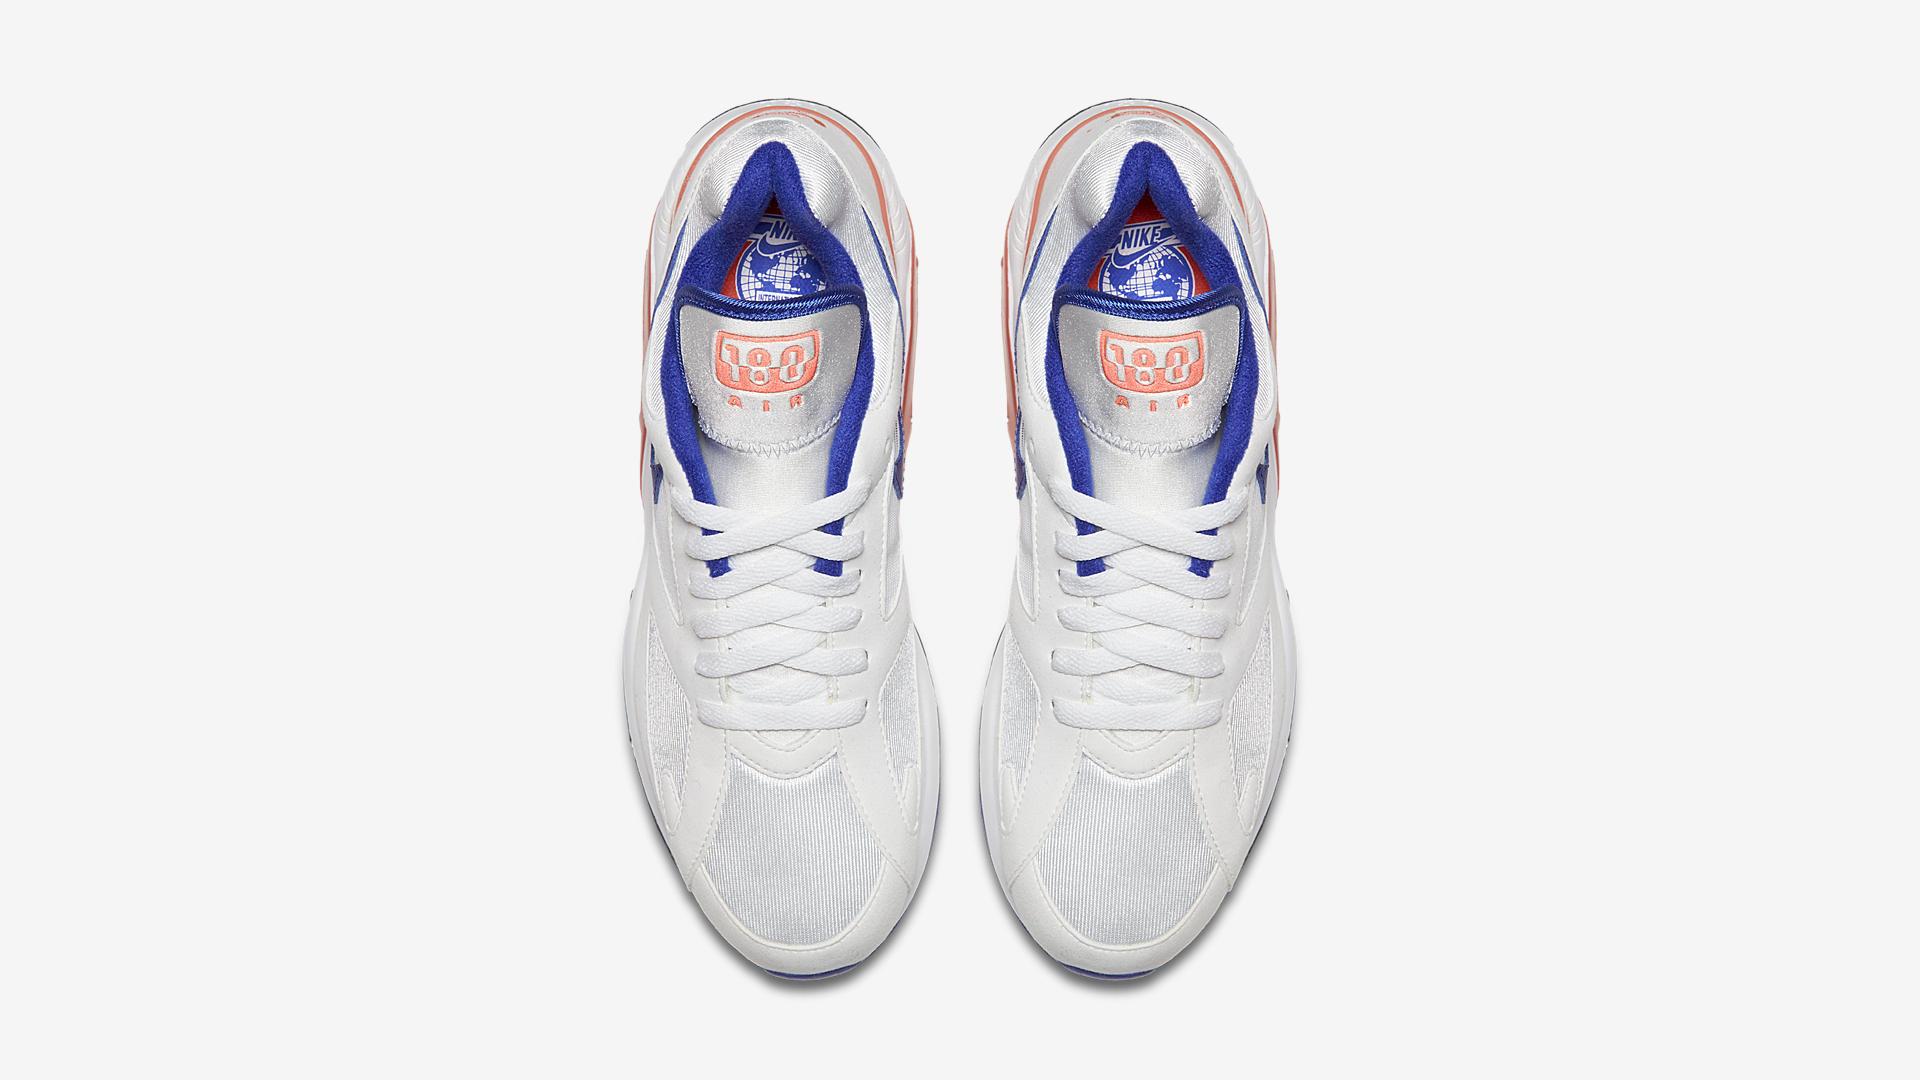 615287 100 Nike Air Max 180 OG 2